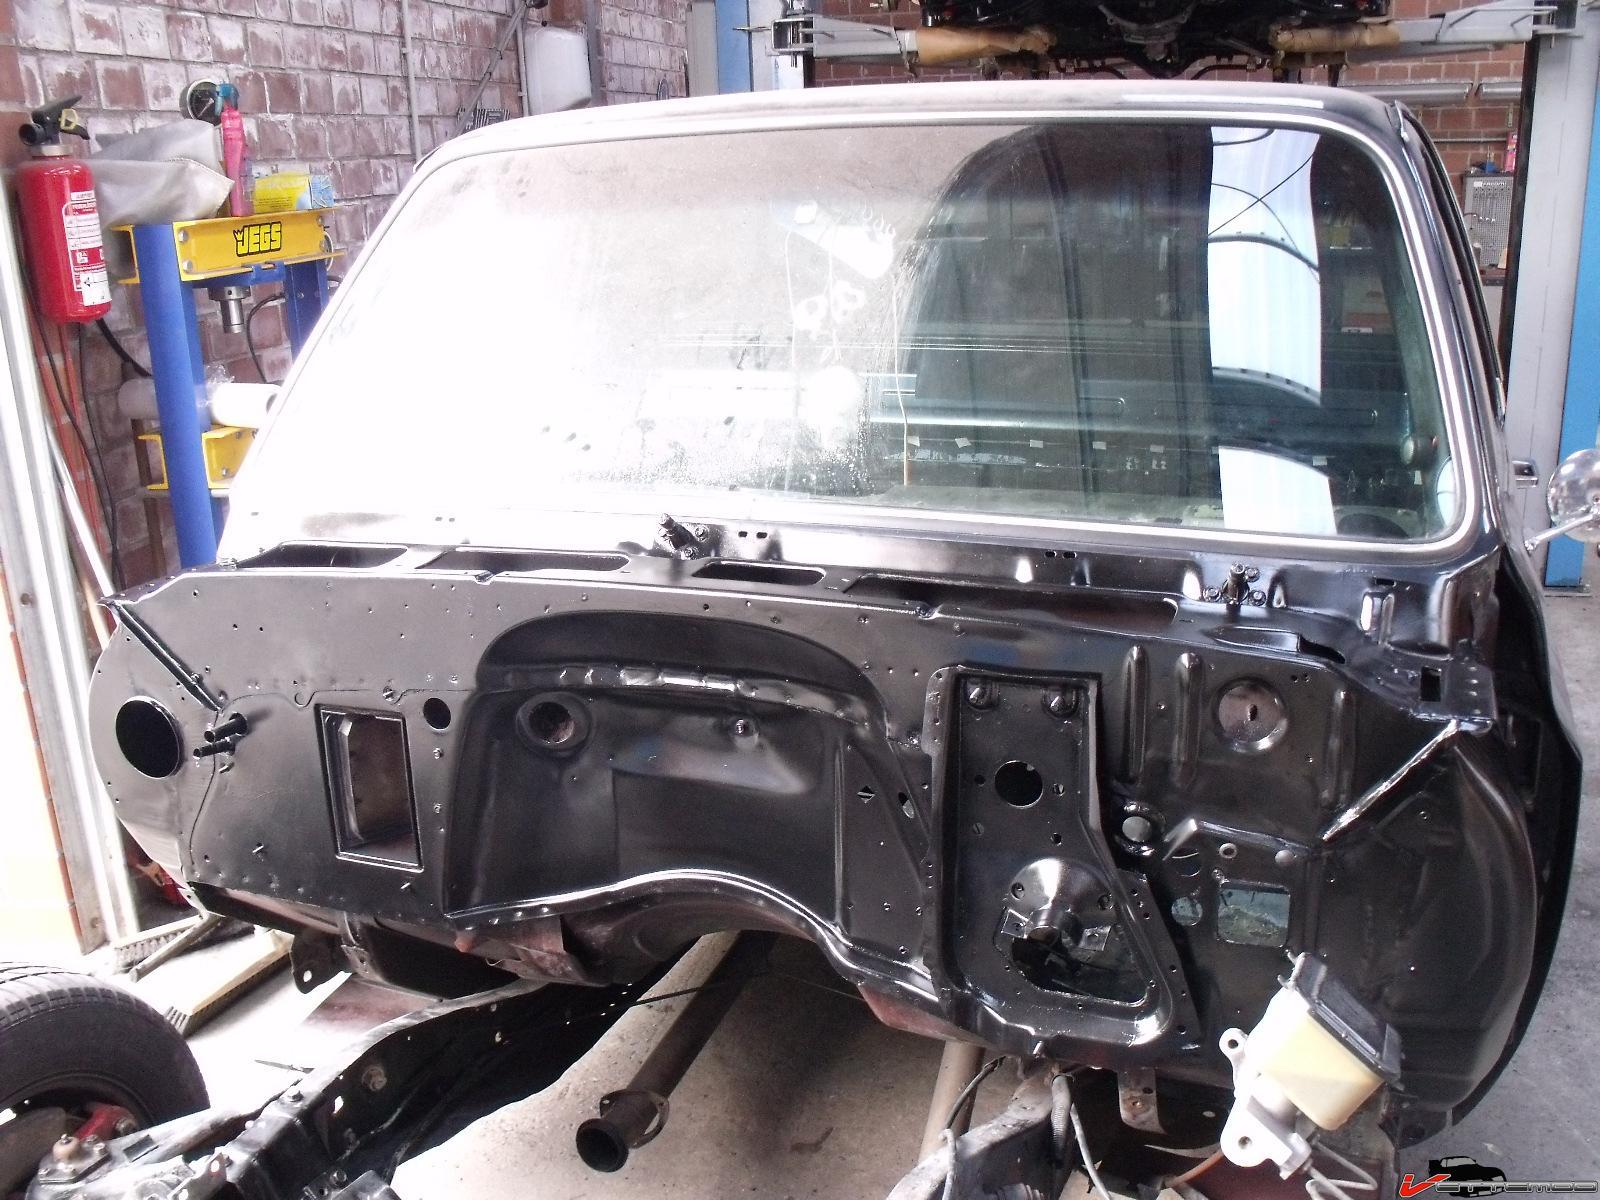 250584783bc276 C Wiring Harness Install After on fog light, fuel pump, best street rod, hot rod, classic truck, aftermarket radio,